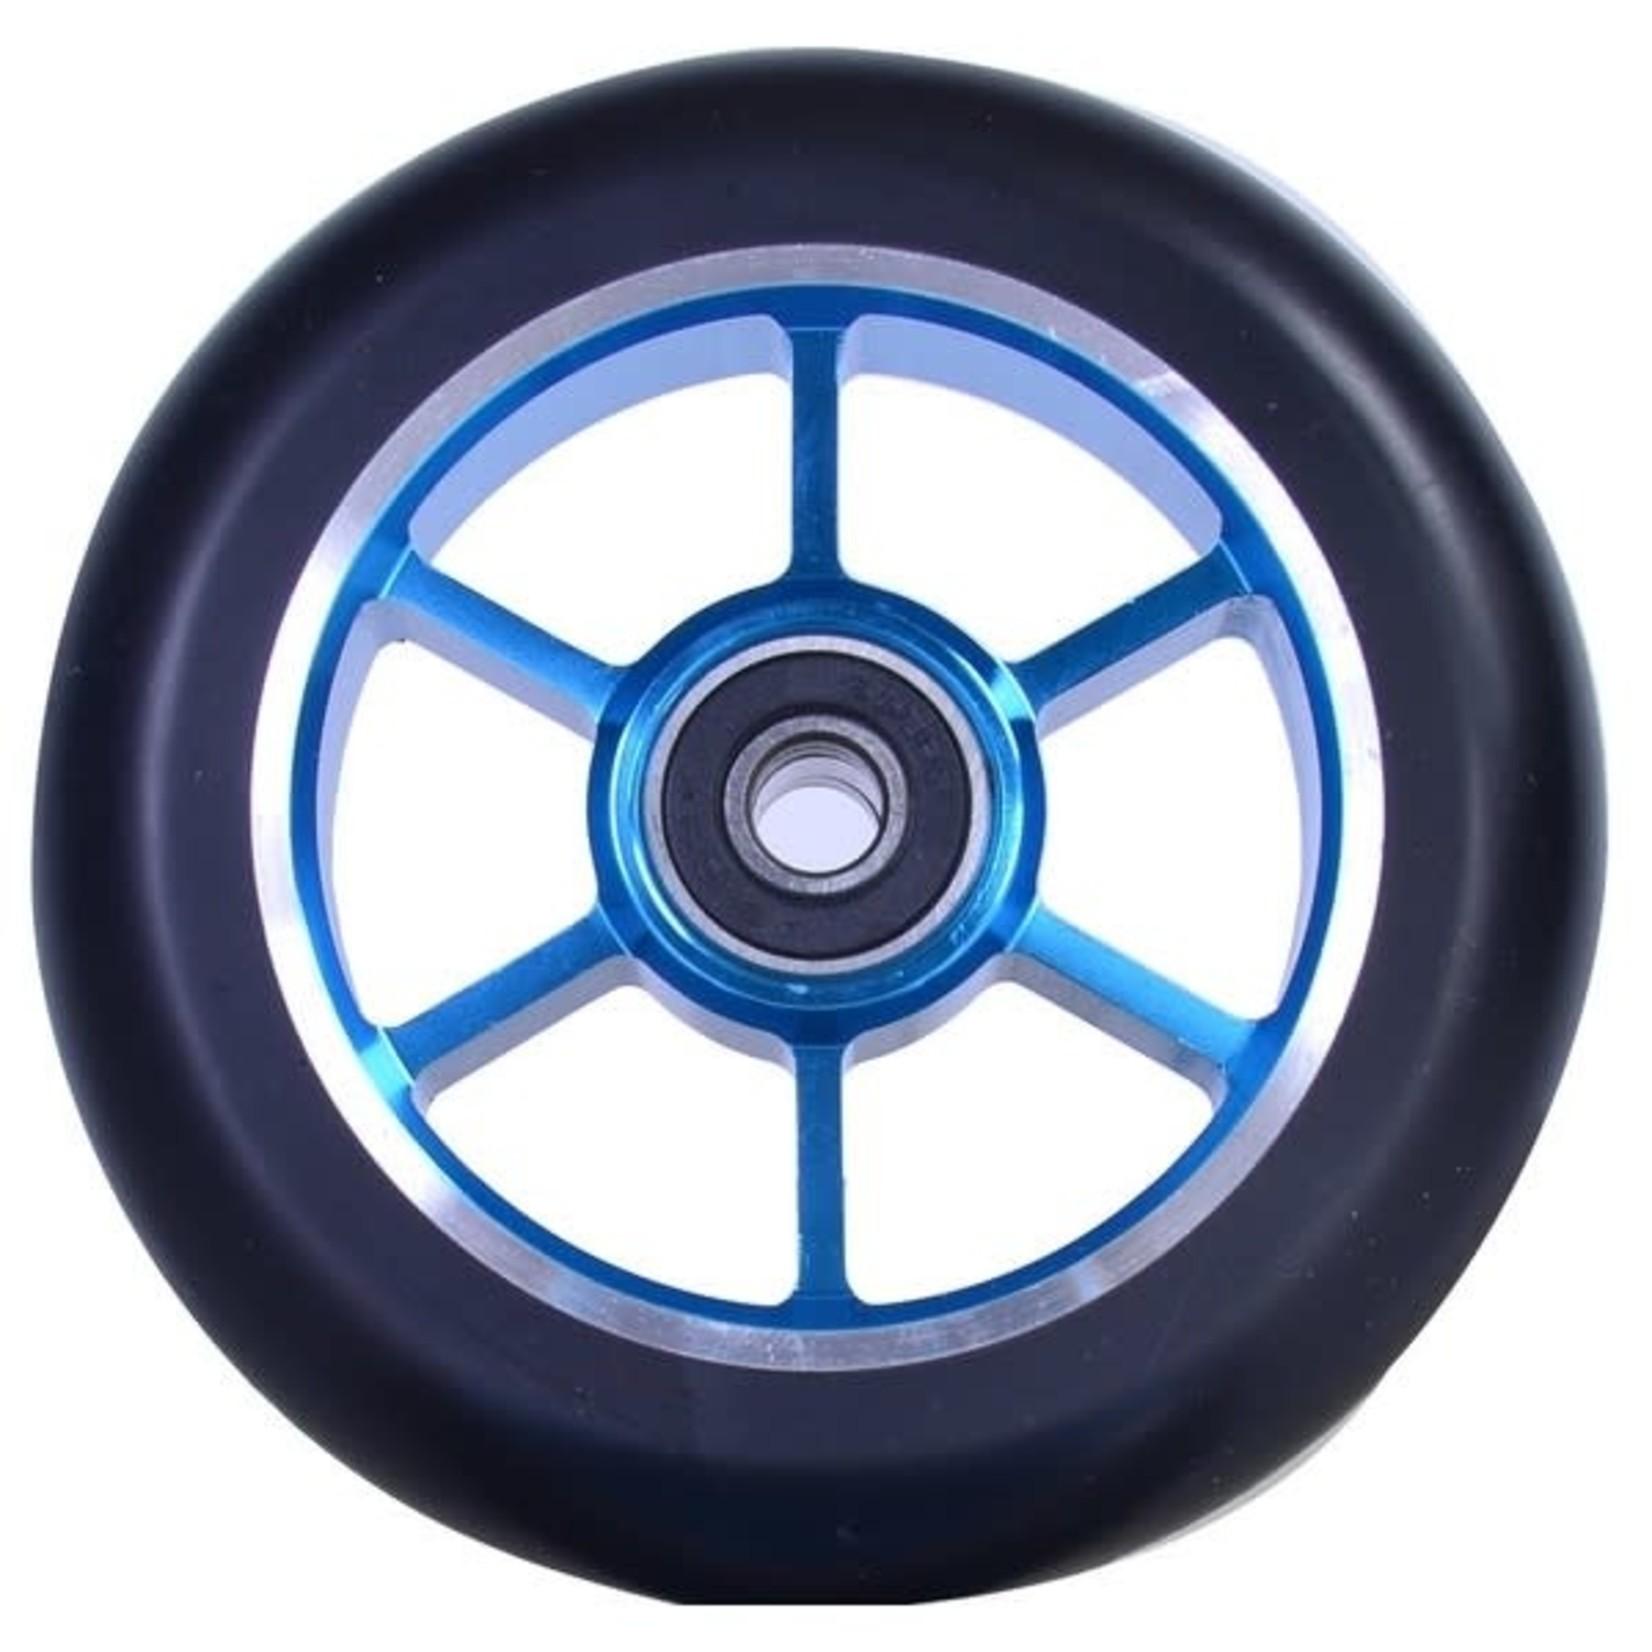 GRIT Grit 100mm 6 Spoke Scooter Wheel Blue/Black